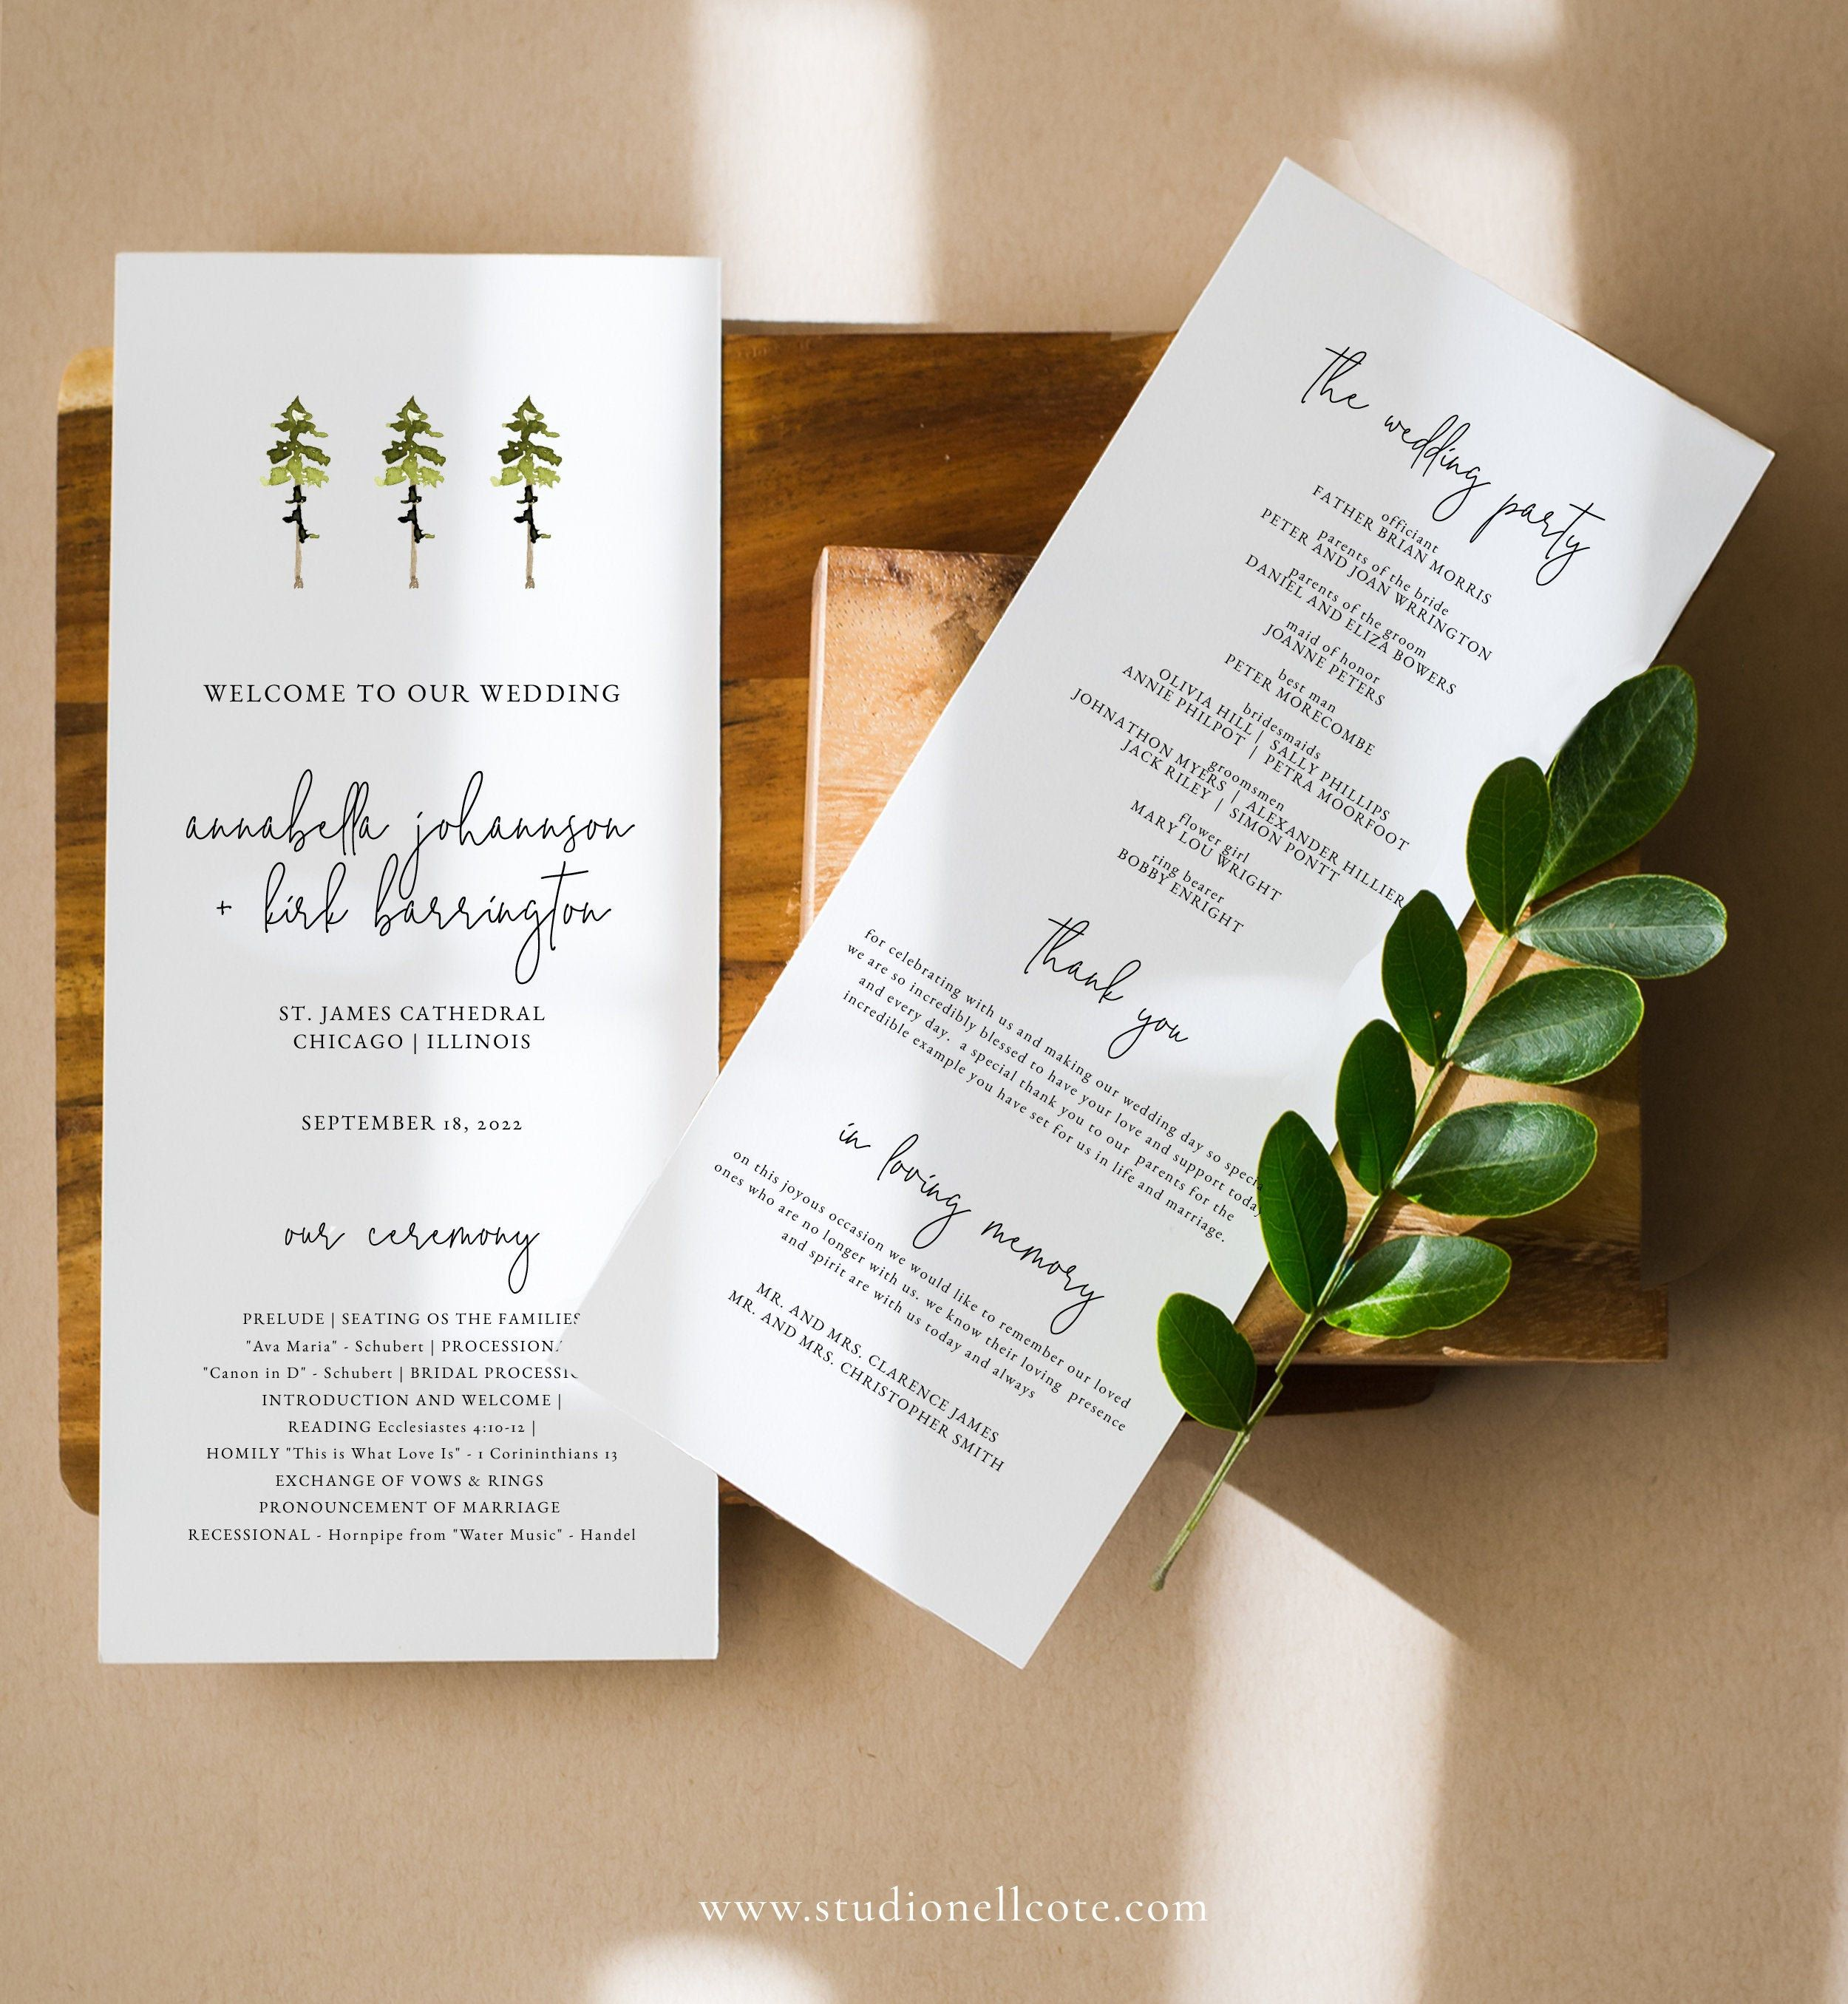 Greenery Wedding Program Fan Printable Template Wedding Fan Program Modern Wedding Program Order of Service EDIT in TEMPLETT Olivia